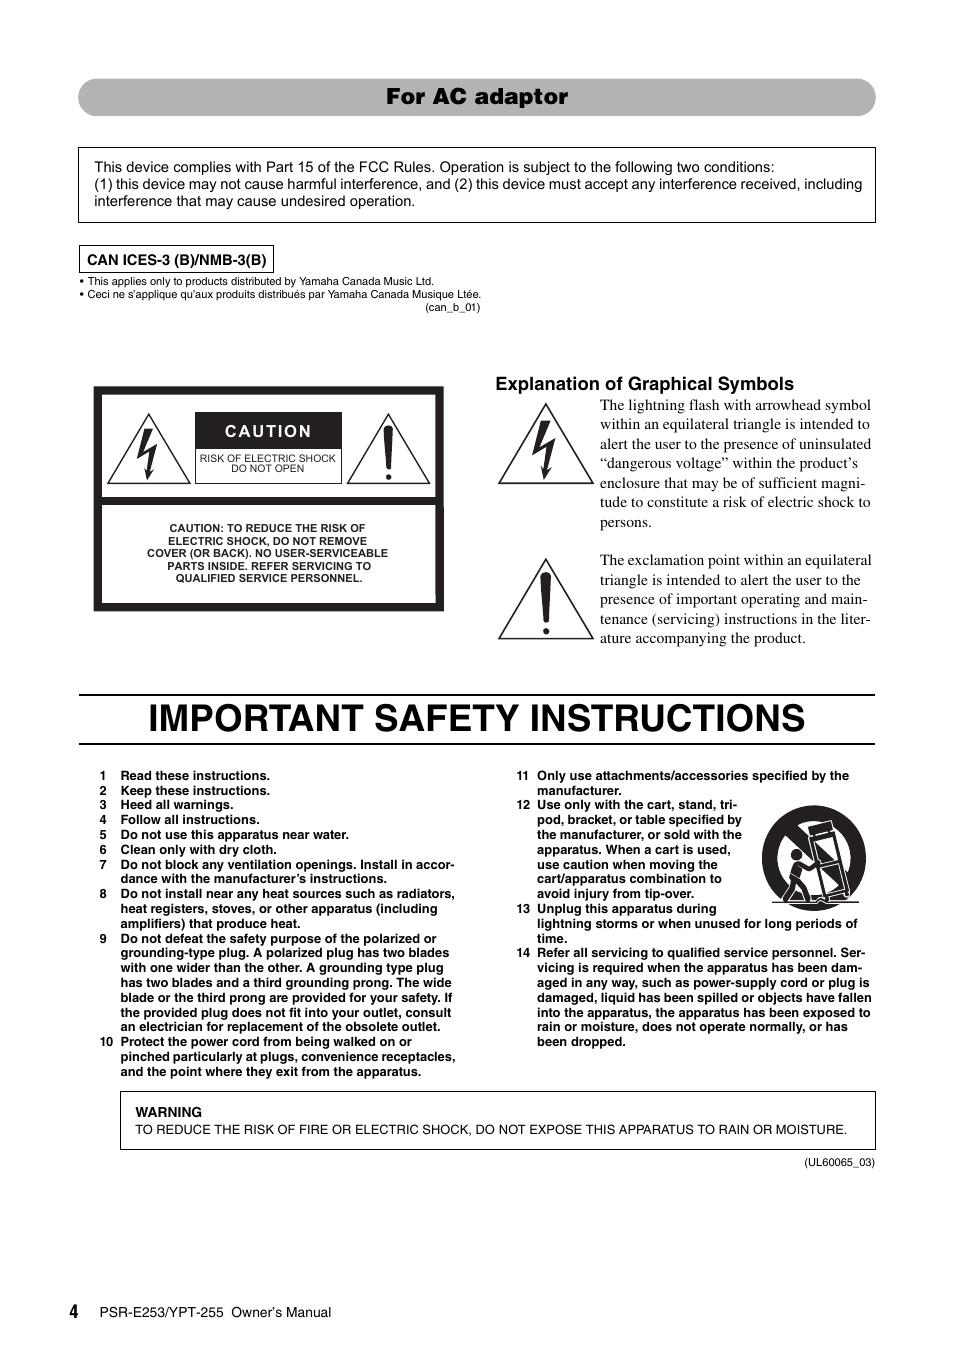 important safety instructions for ac adaptor explanation of rh manualsdir com Yamaha Stereo Manuals Yamaha DSP Cinima User Manuals